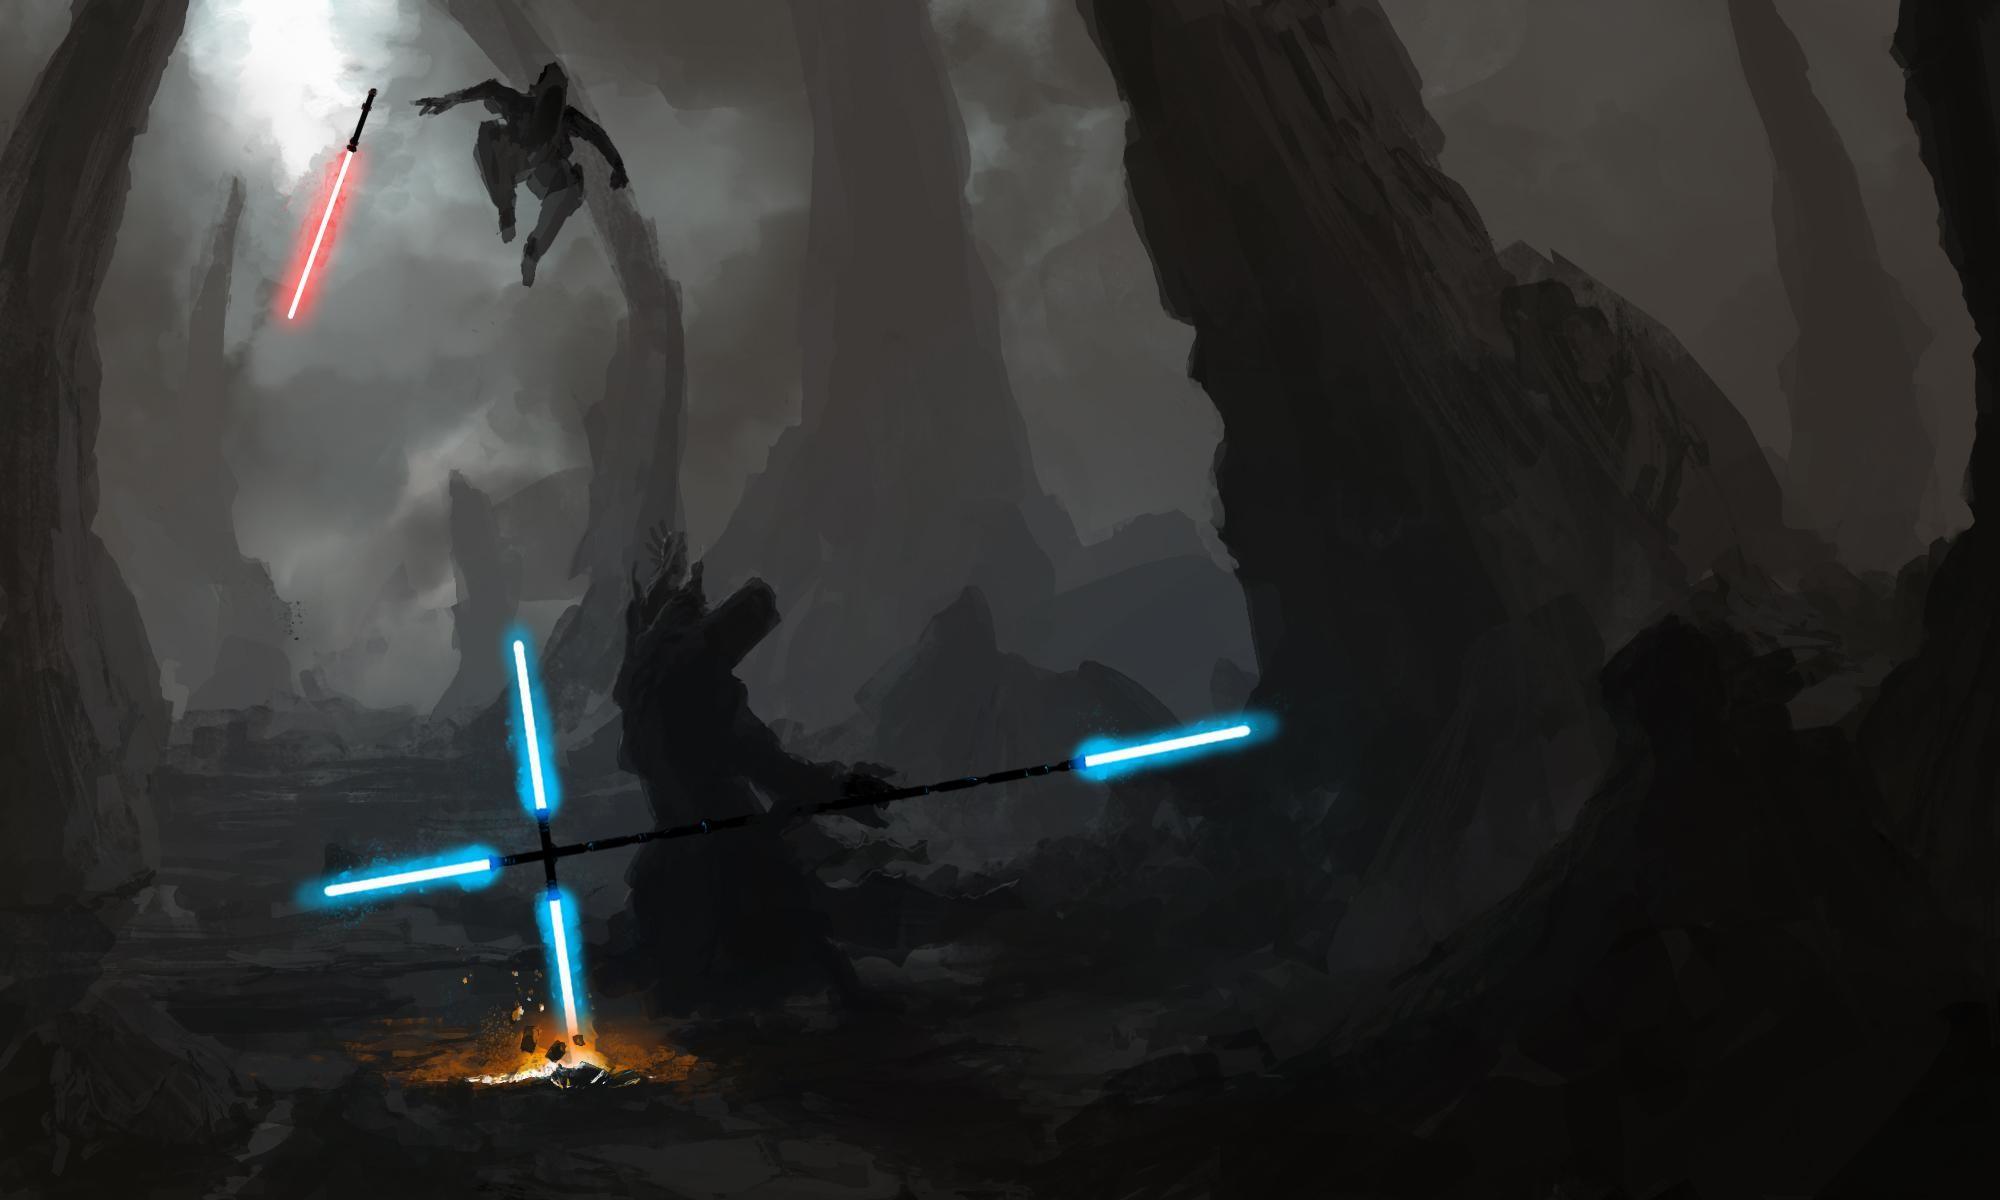 wallpaper.wiki-Free-Images-HD-Epic-Star-Wars-